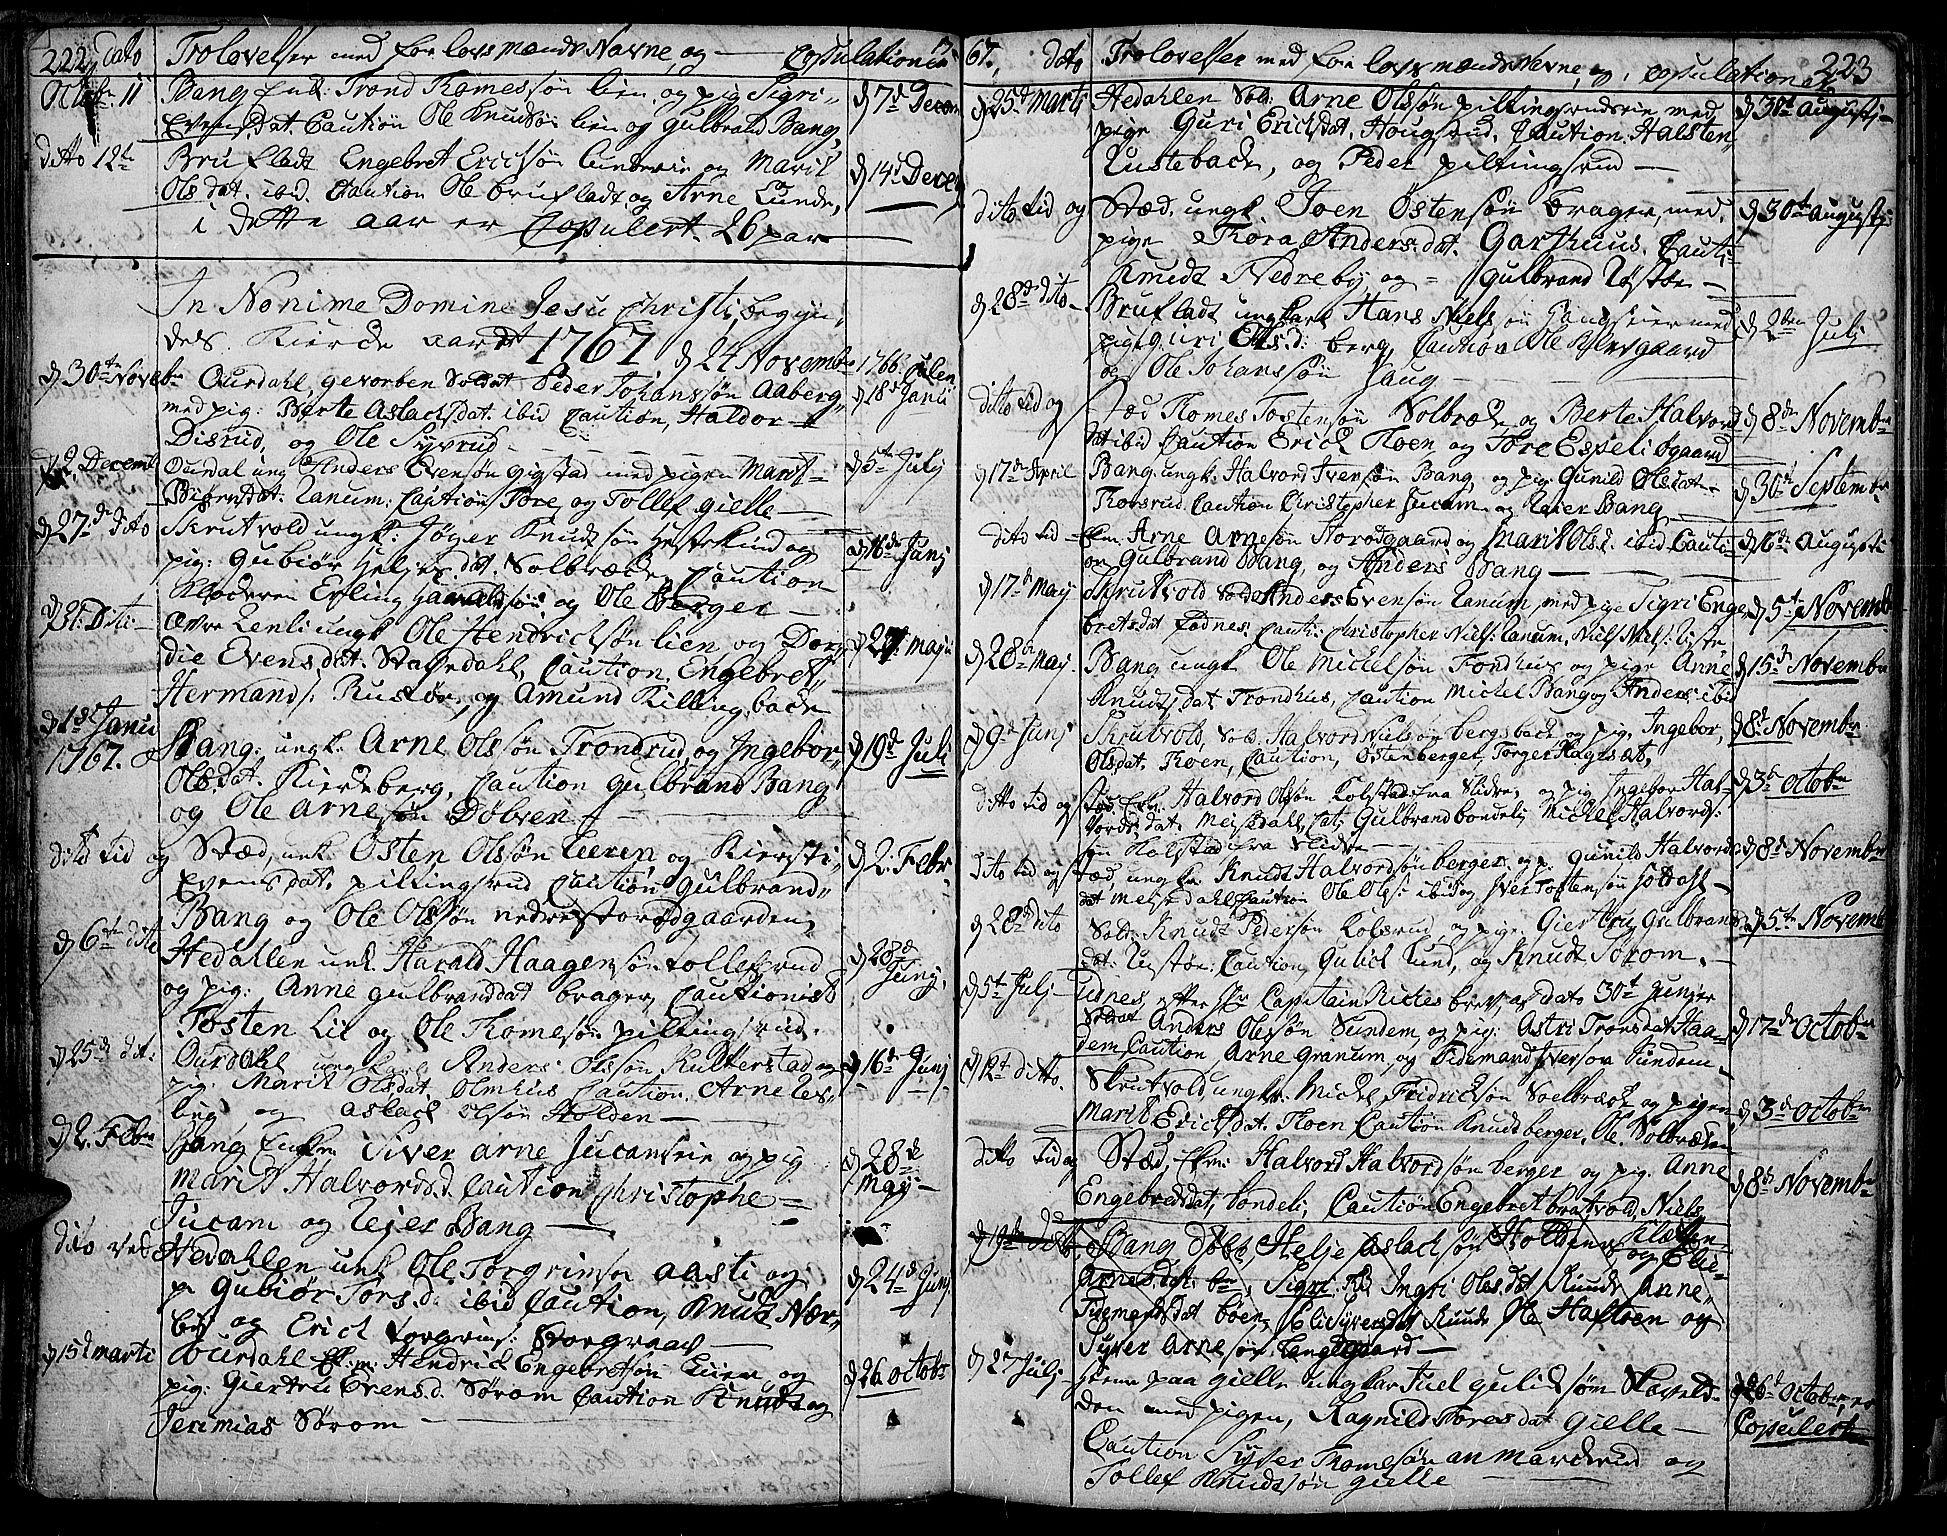 SAH, Aurdal prestekontor, Ministerialbok nr. 5, 1763-1781, s. 222-223